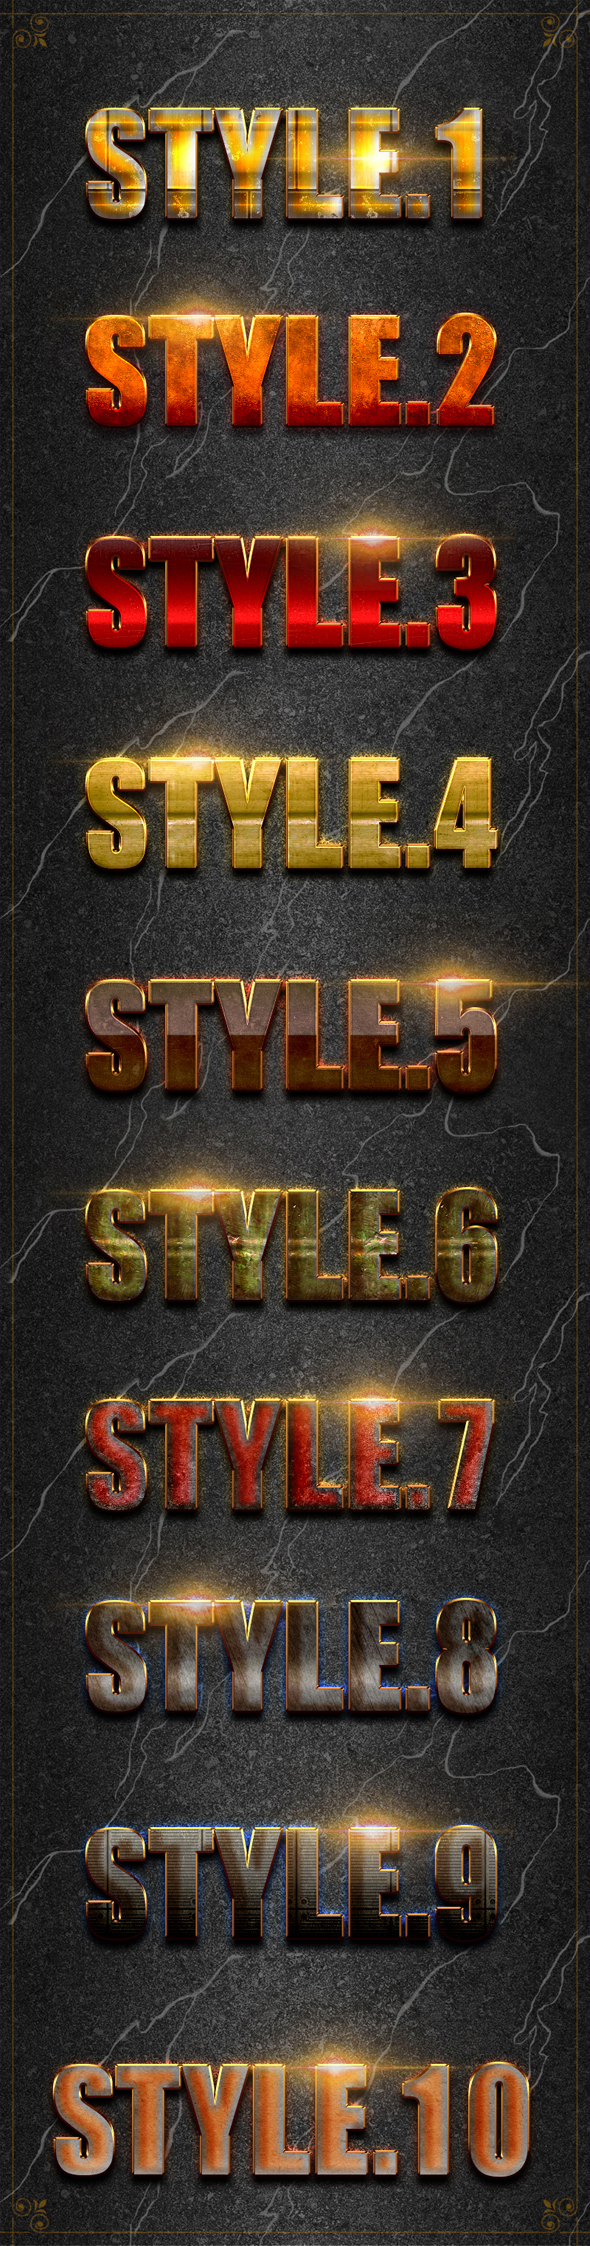 10 3D Text Styles D_52 - Text Effects Styles